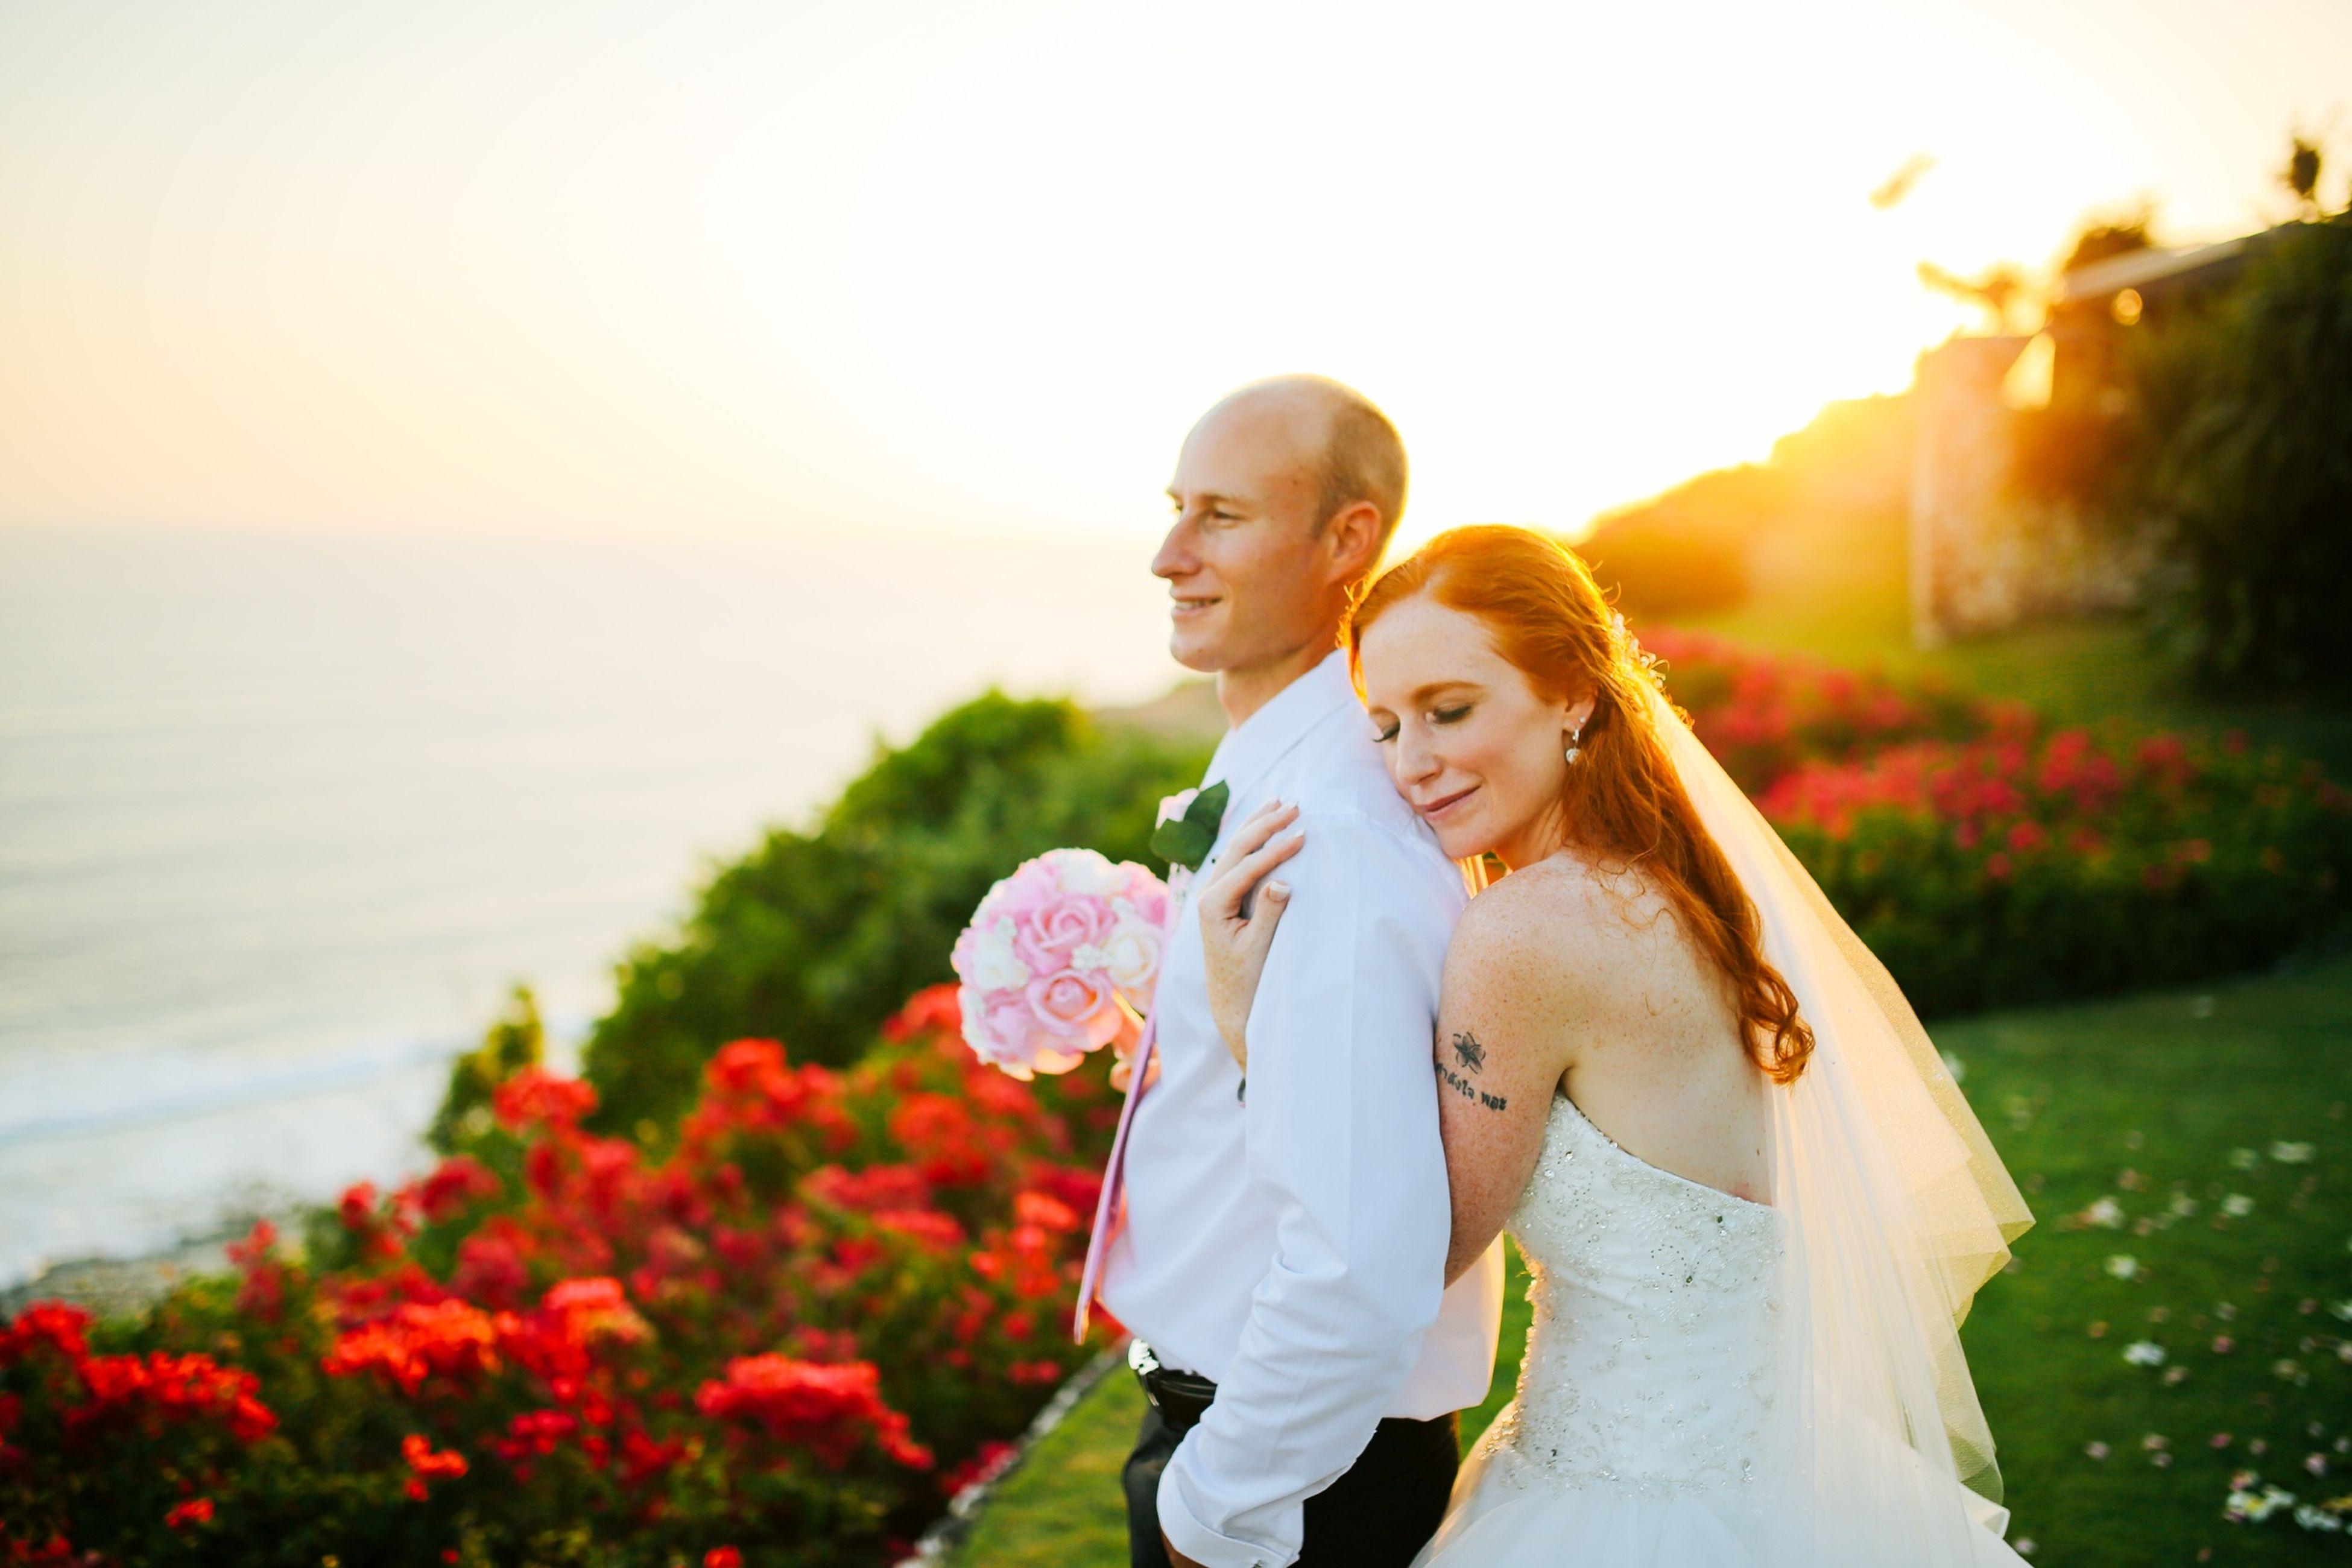 A warm and joyful atmosphere from the wedding of Amber & Daniel Beautiful Surroundings Wedding Photography Wedding Bali Wedding Wedding In Bali Love Sunset